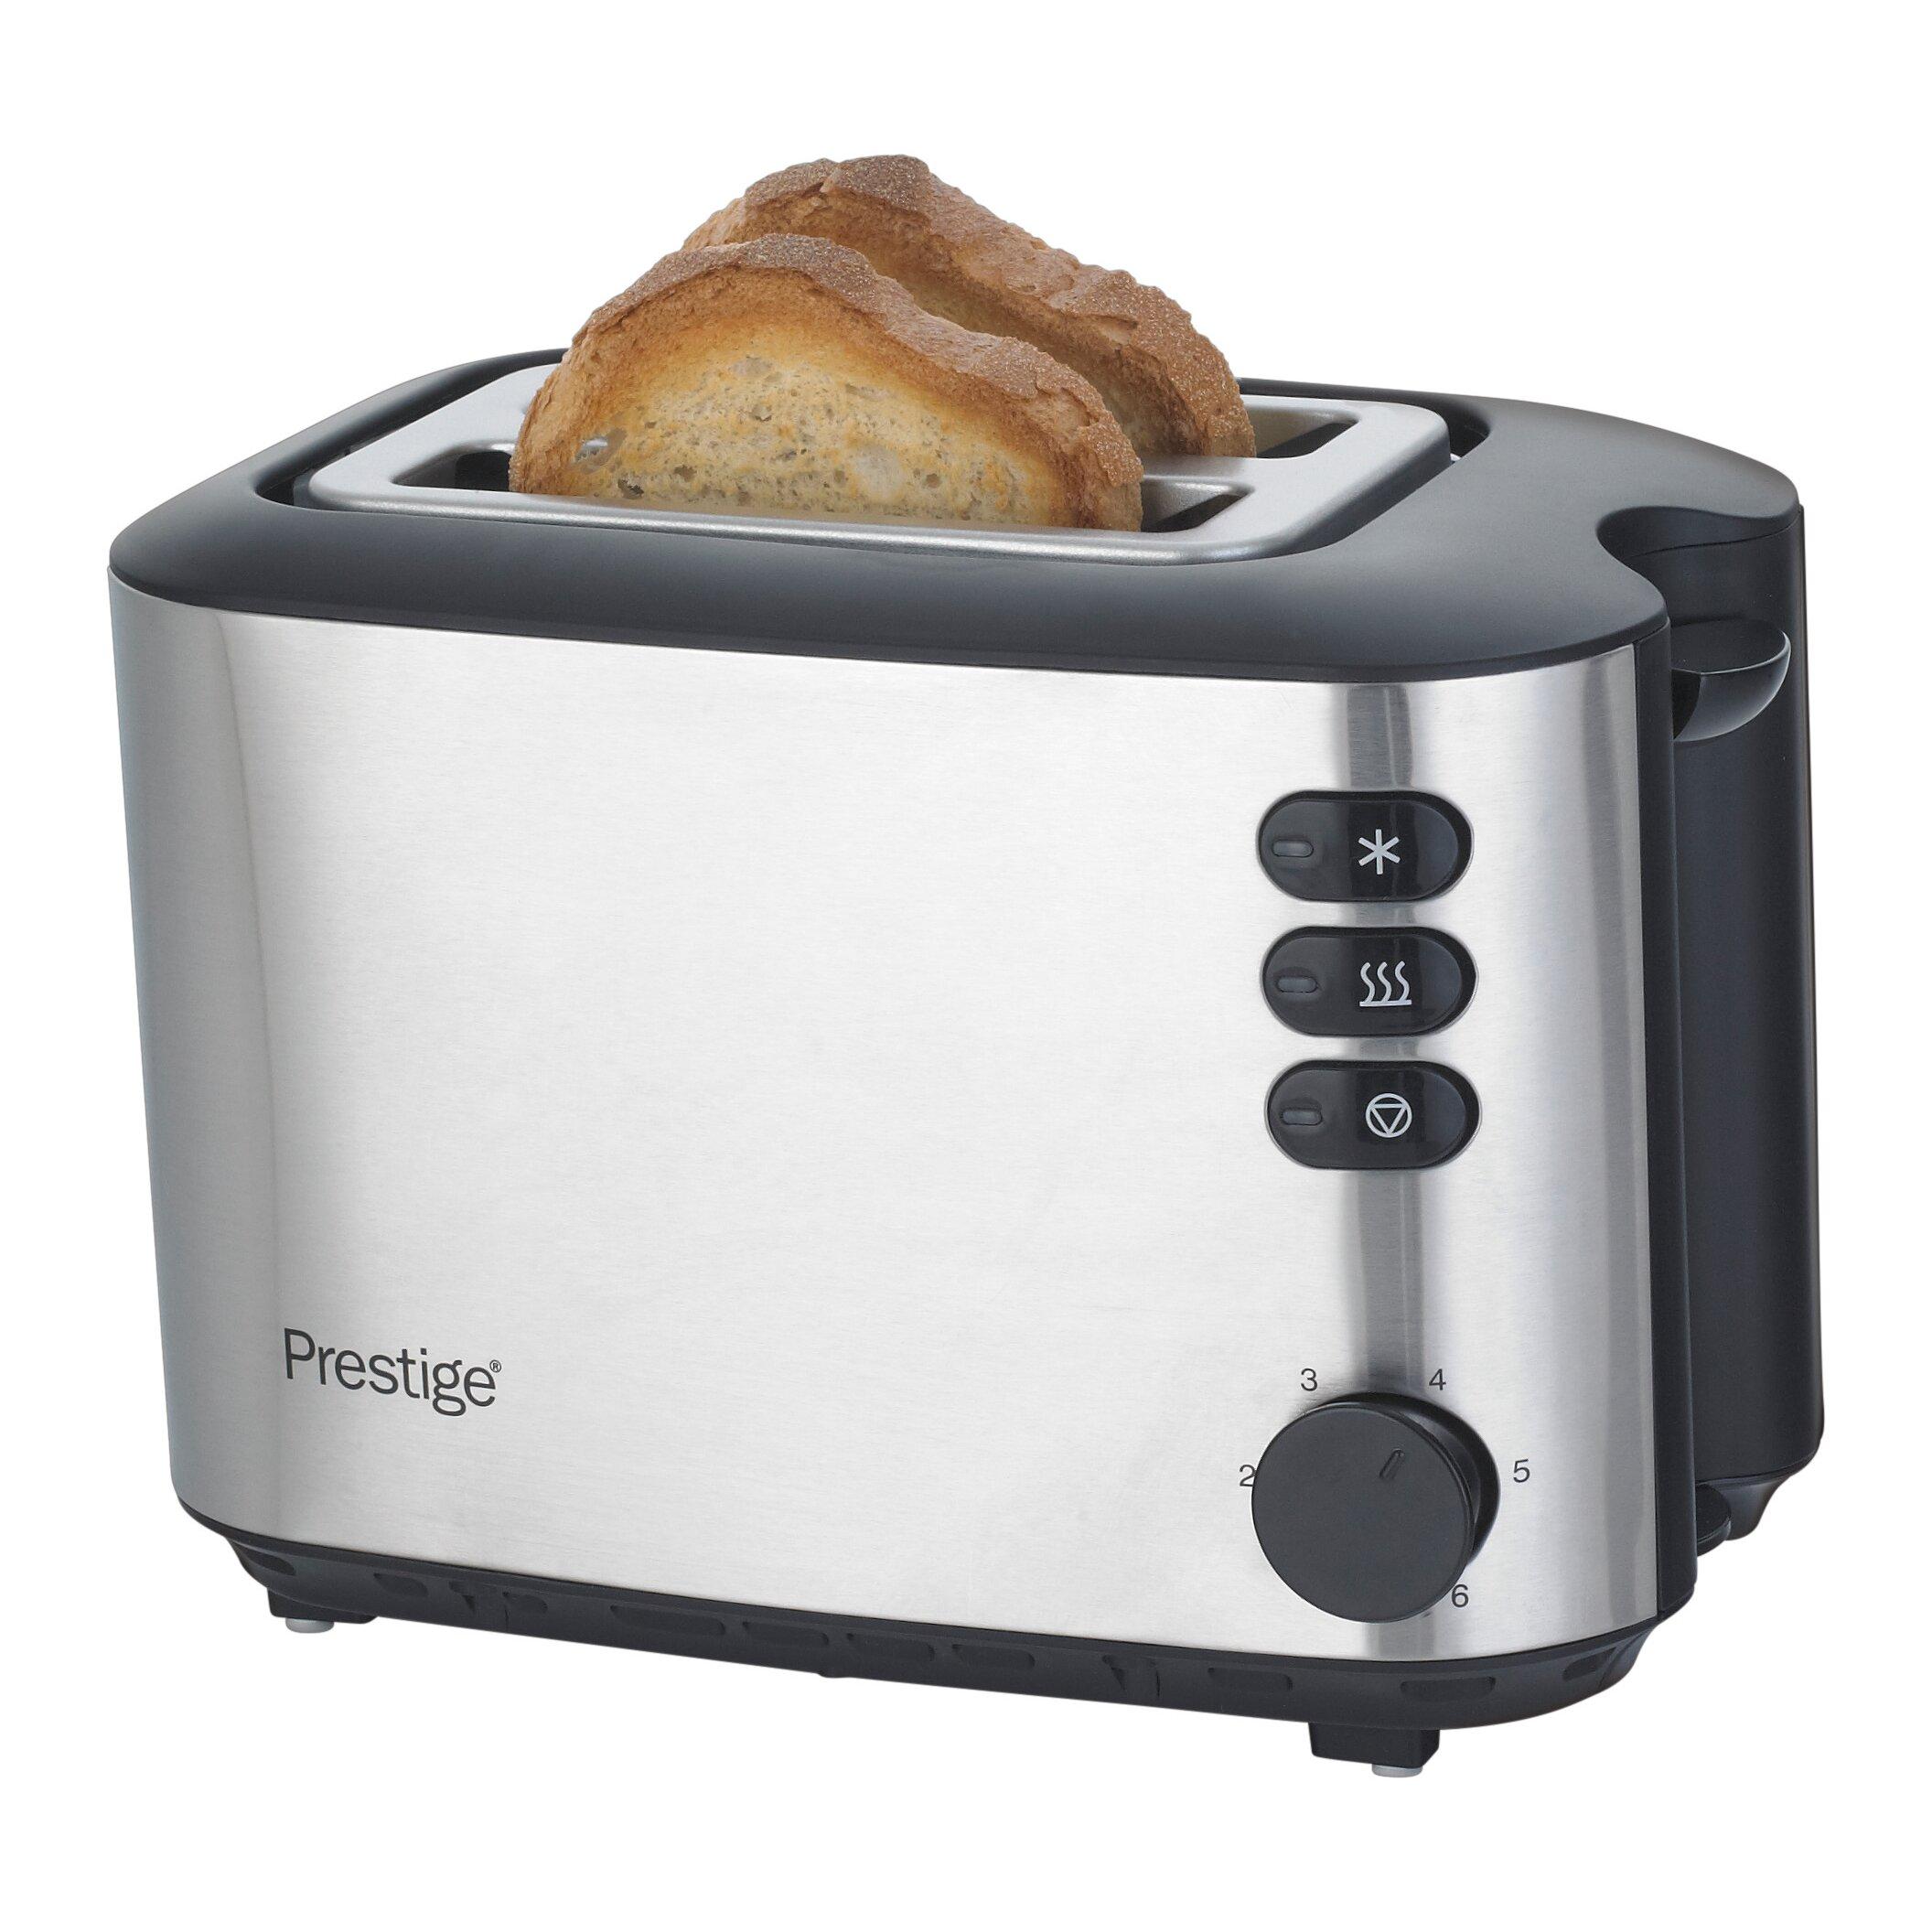 Prestige 2 Slice Brushed Stainless Steel Toaster